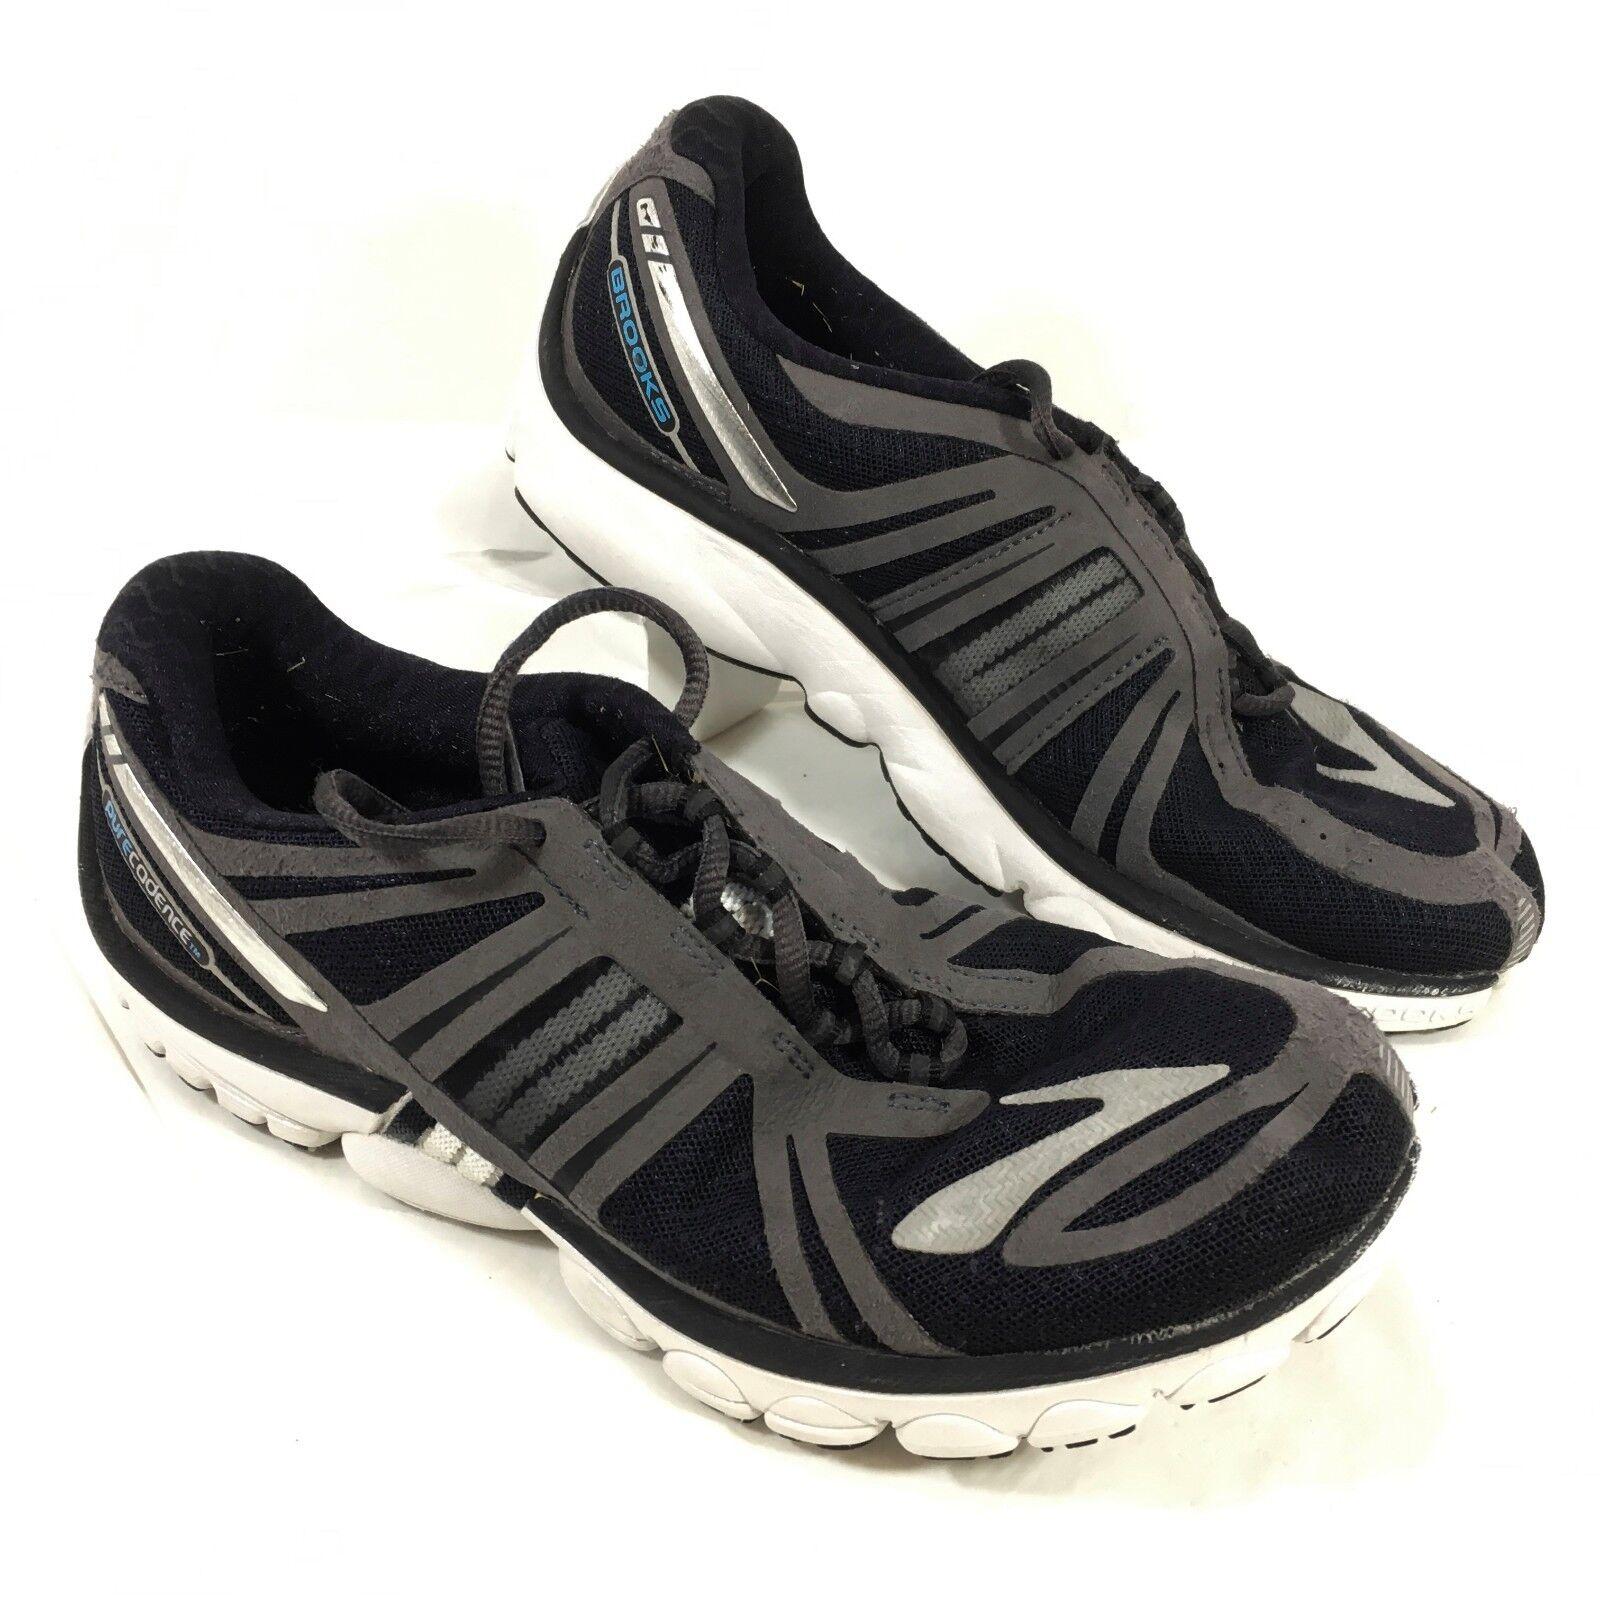 EUC Women's BROOKS Running shoes Black Pure Cadence Sz 9 M